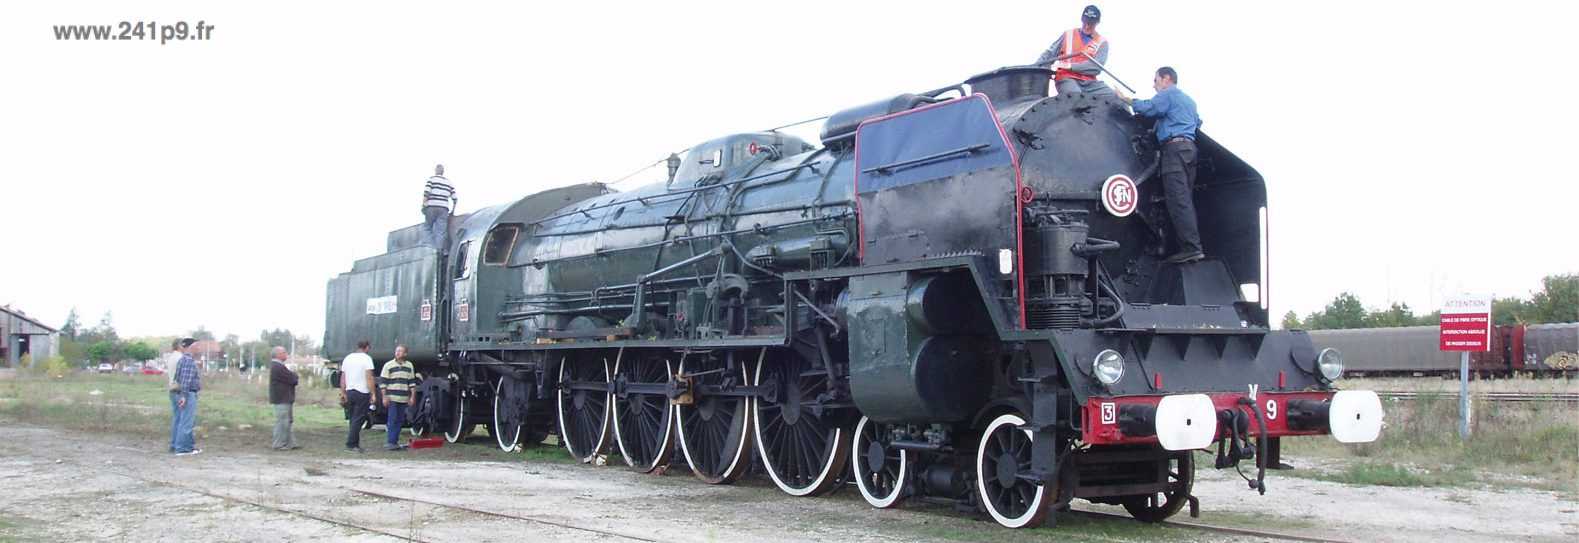 241-P-9